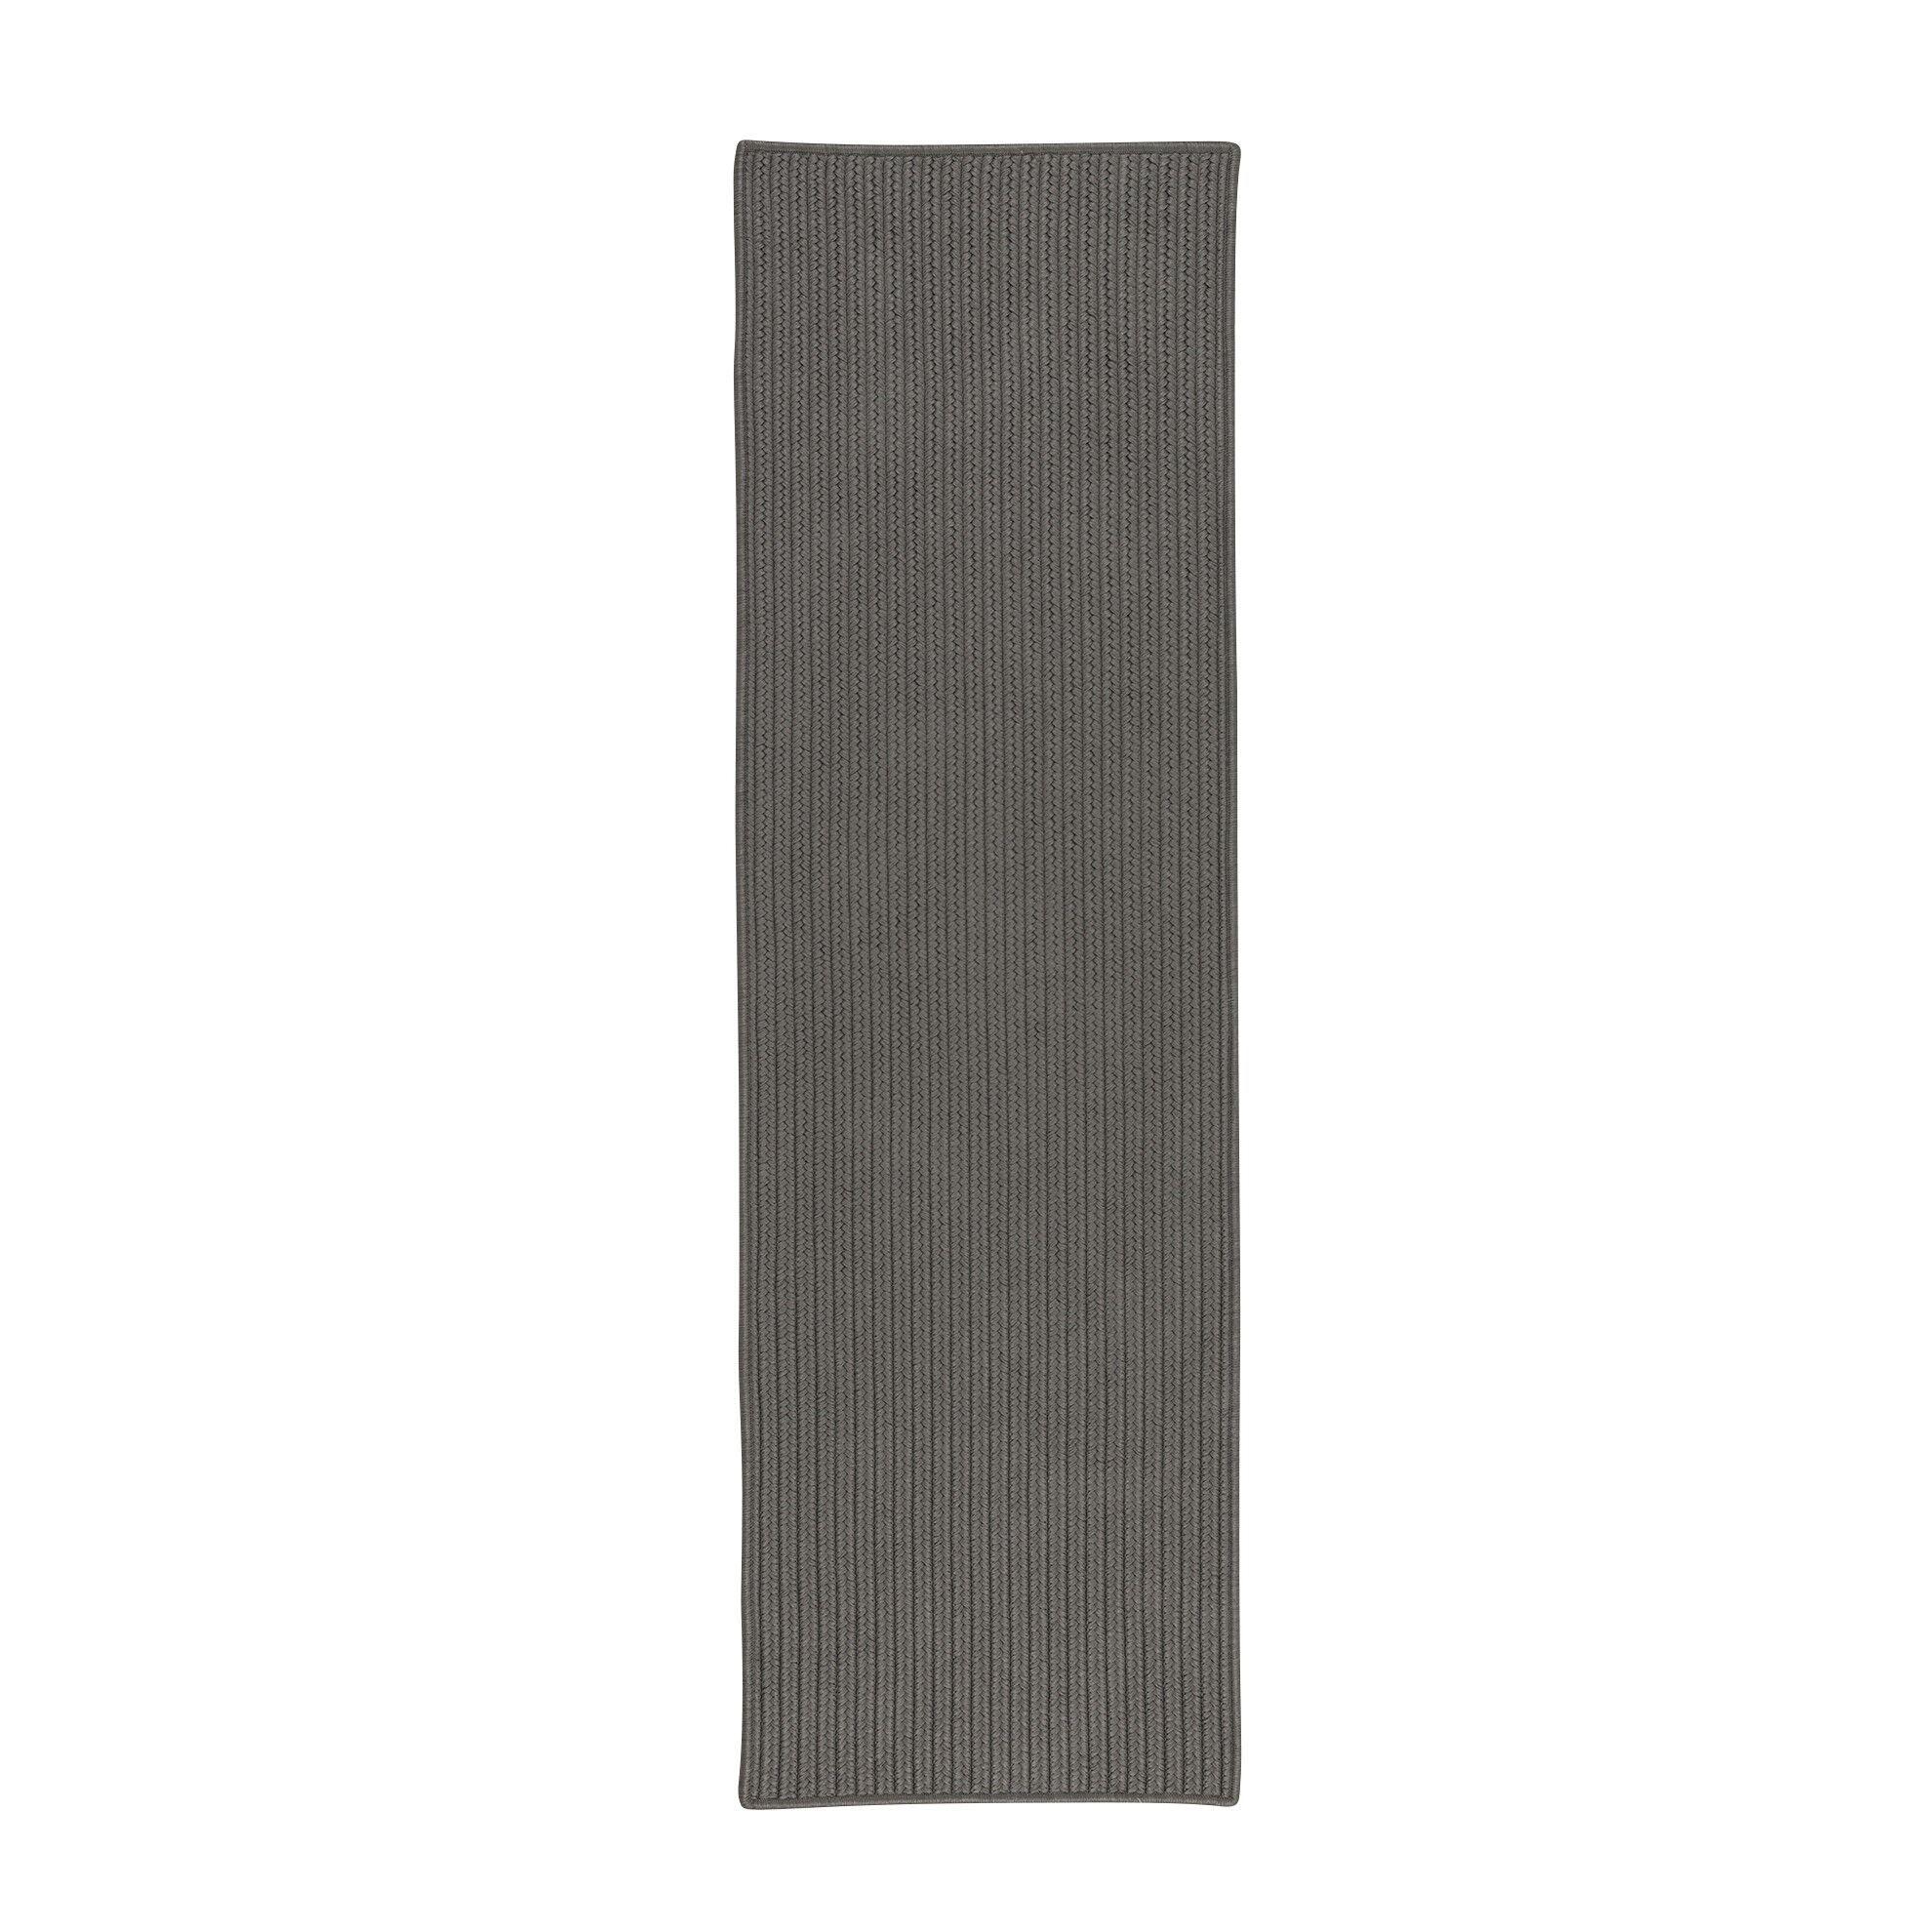 2 5 X 9 Gray All Purpose Reversible Rectangular Mudroom Rug Runner 34233099 In 2020 Rug Runner Rugs Rug Making